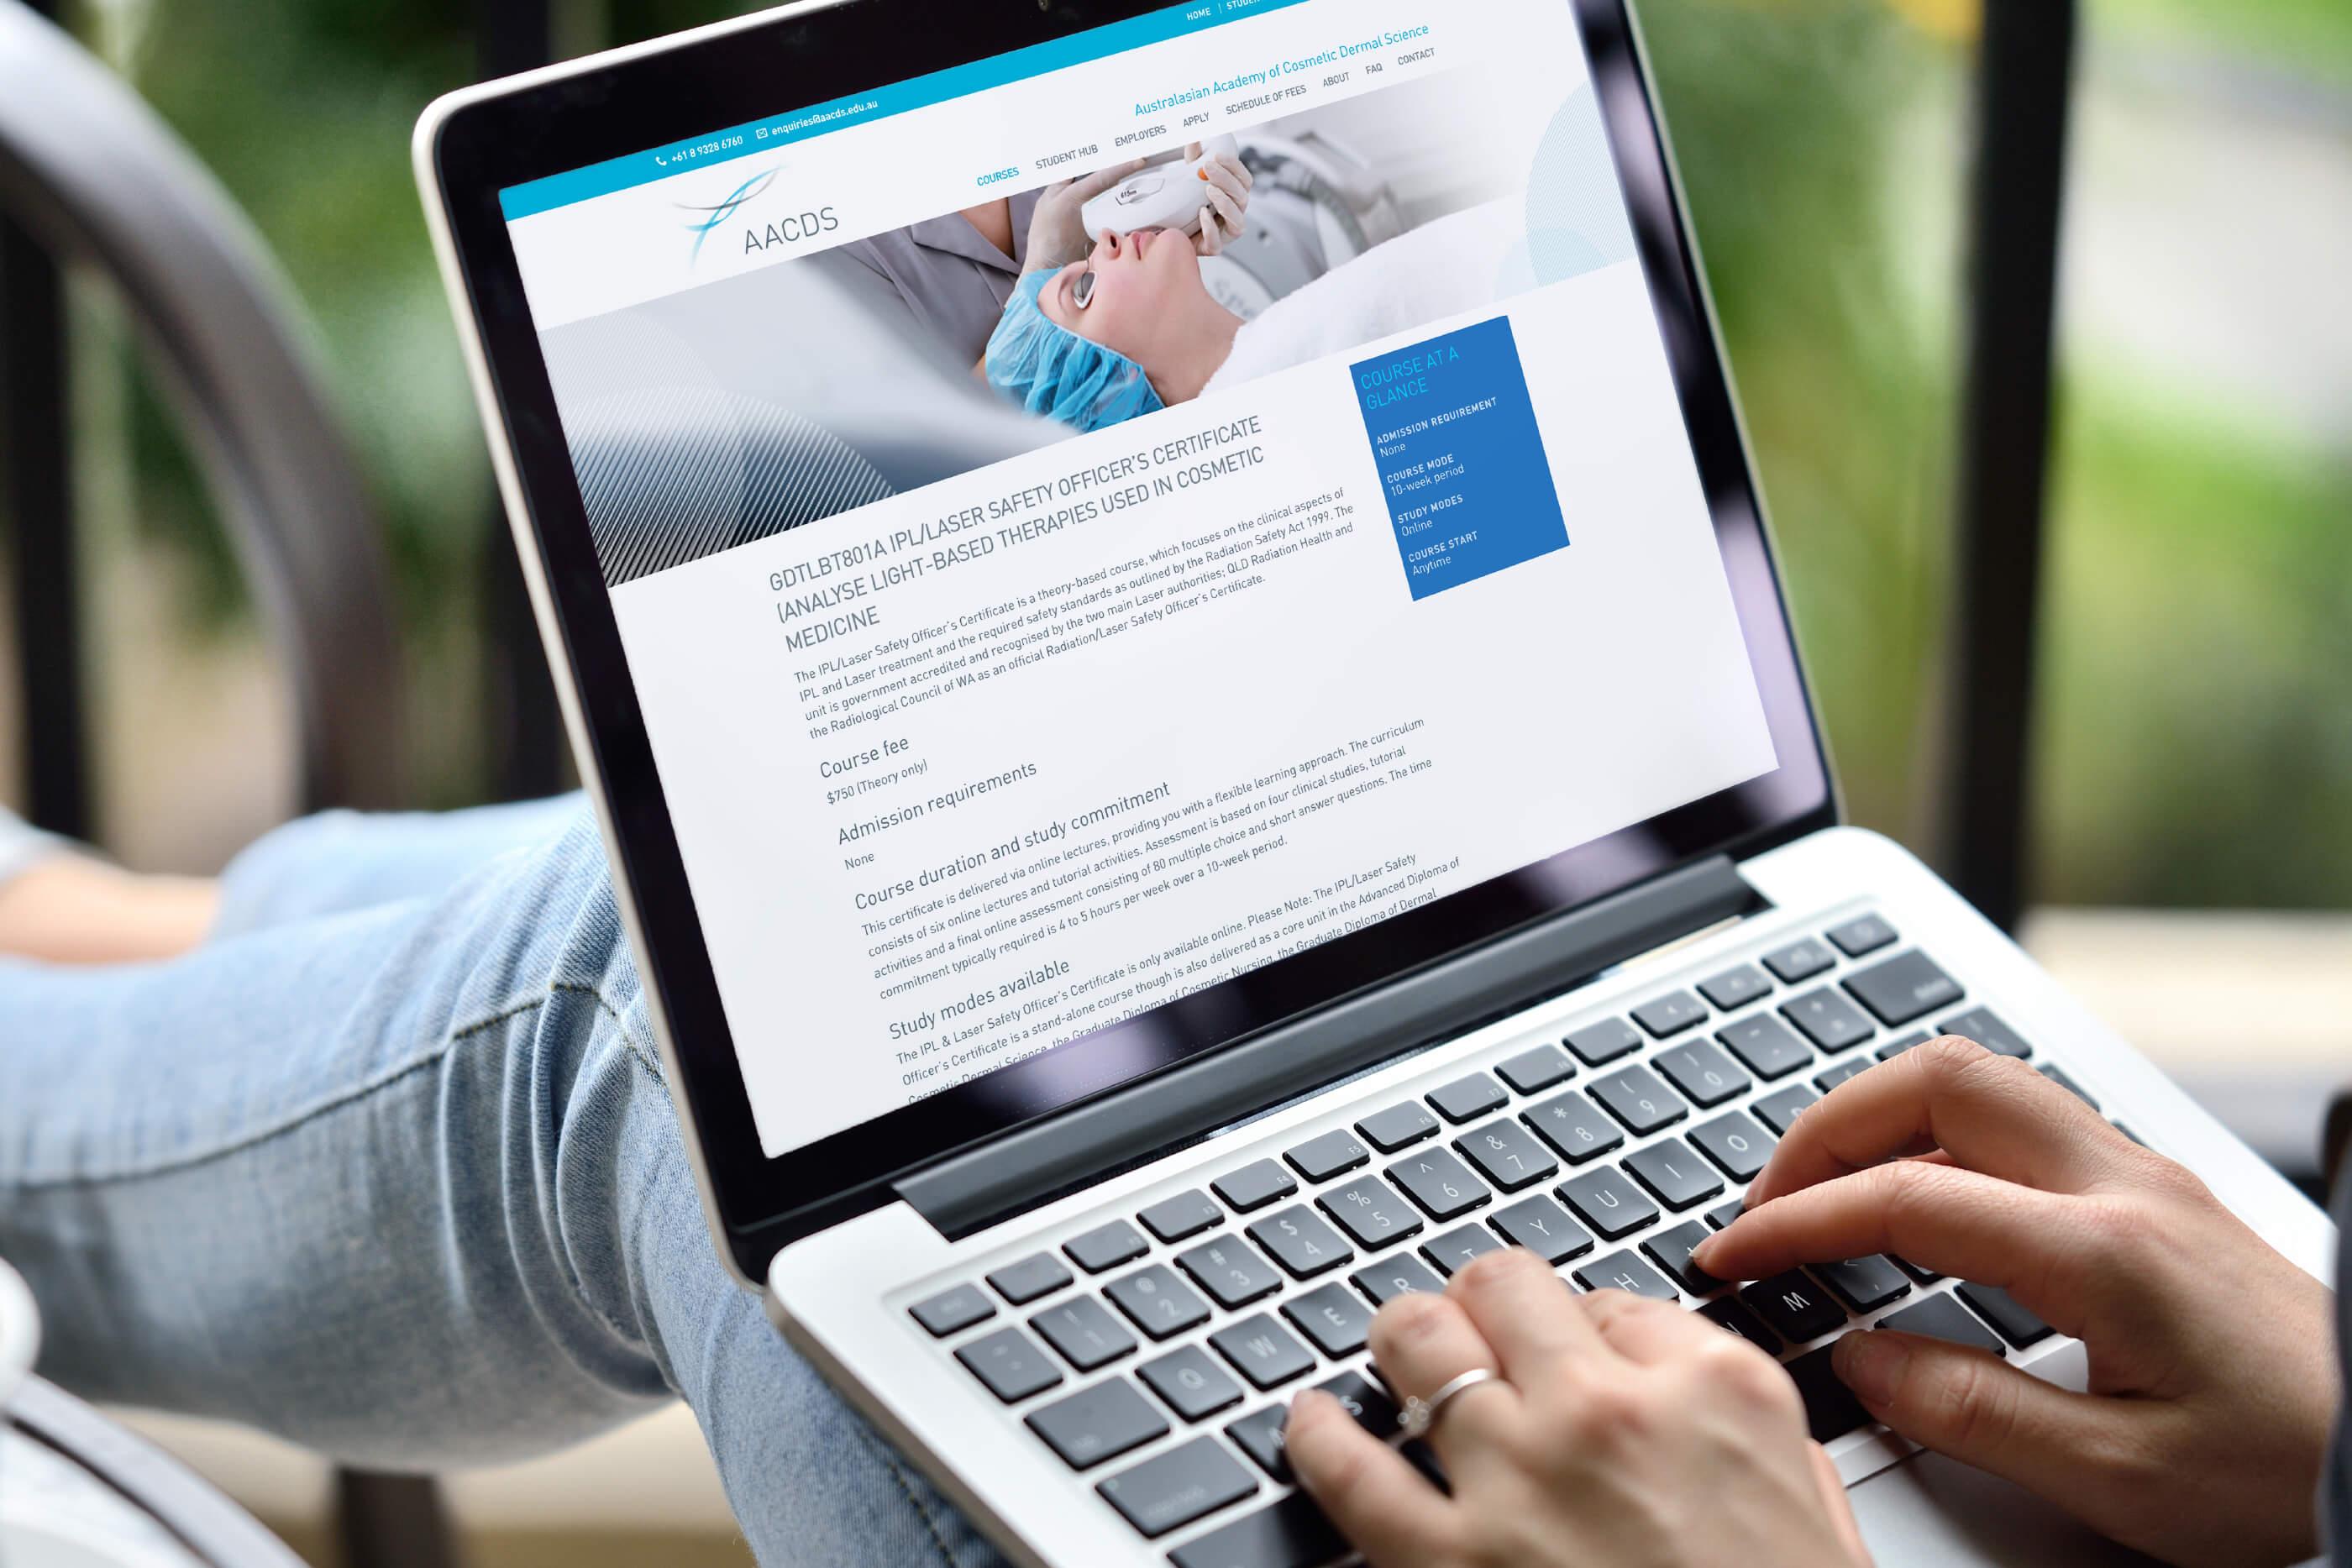 aacds_web_laptop